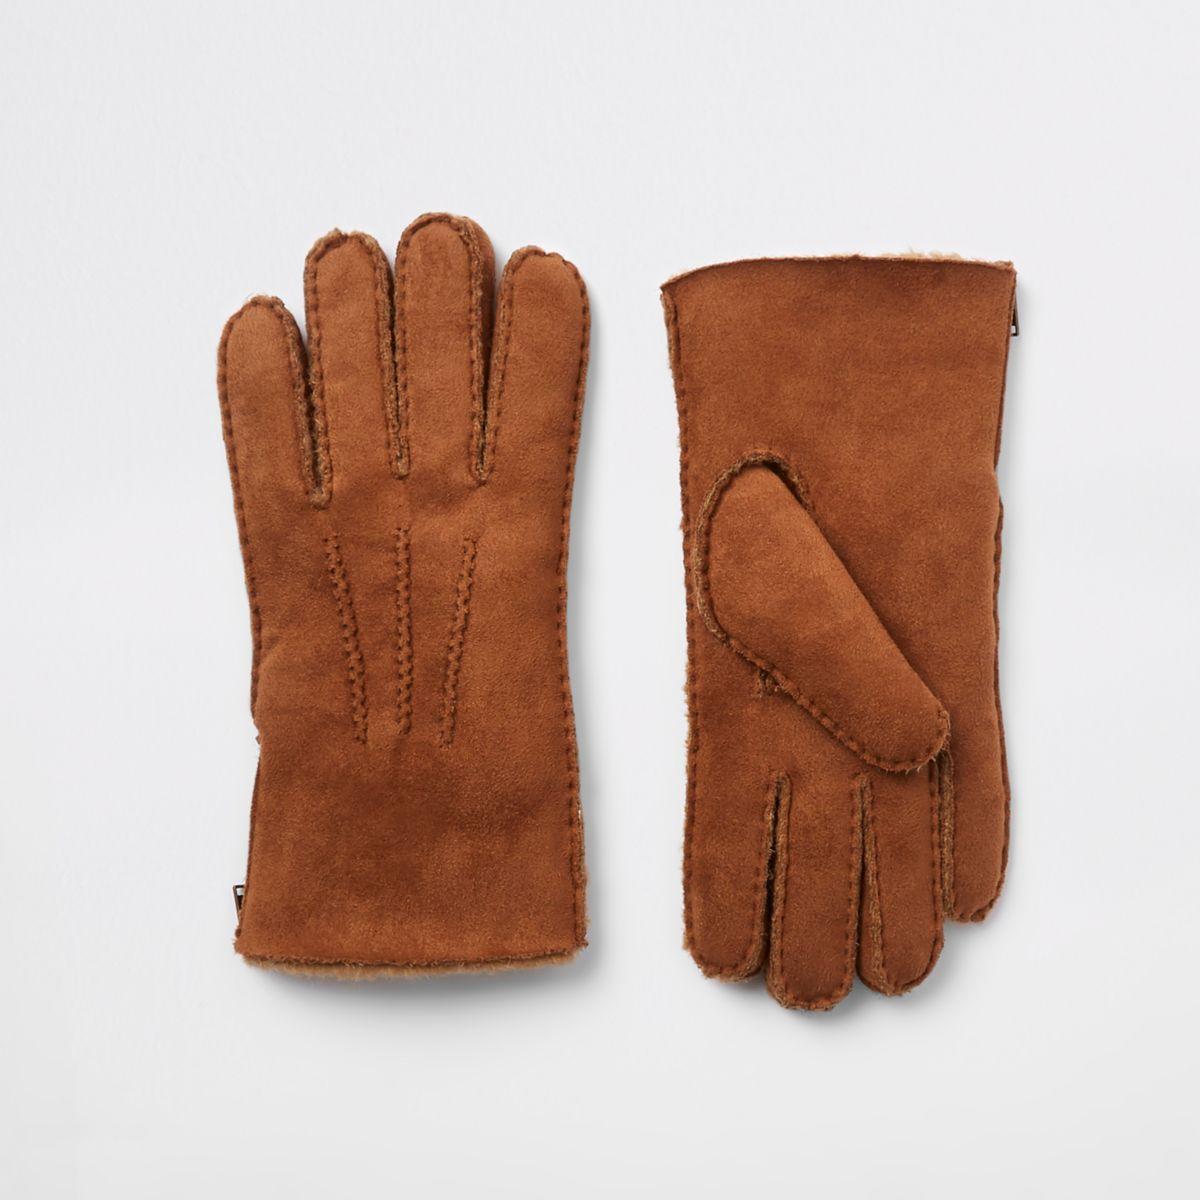 Tan suede fleece lined gloves